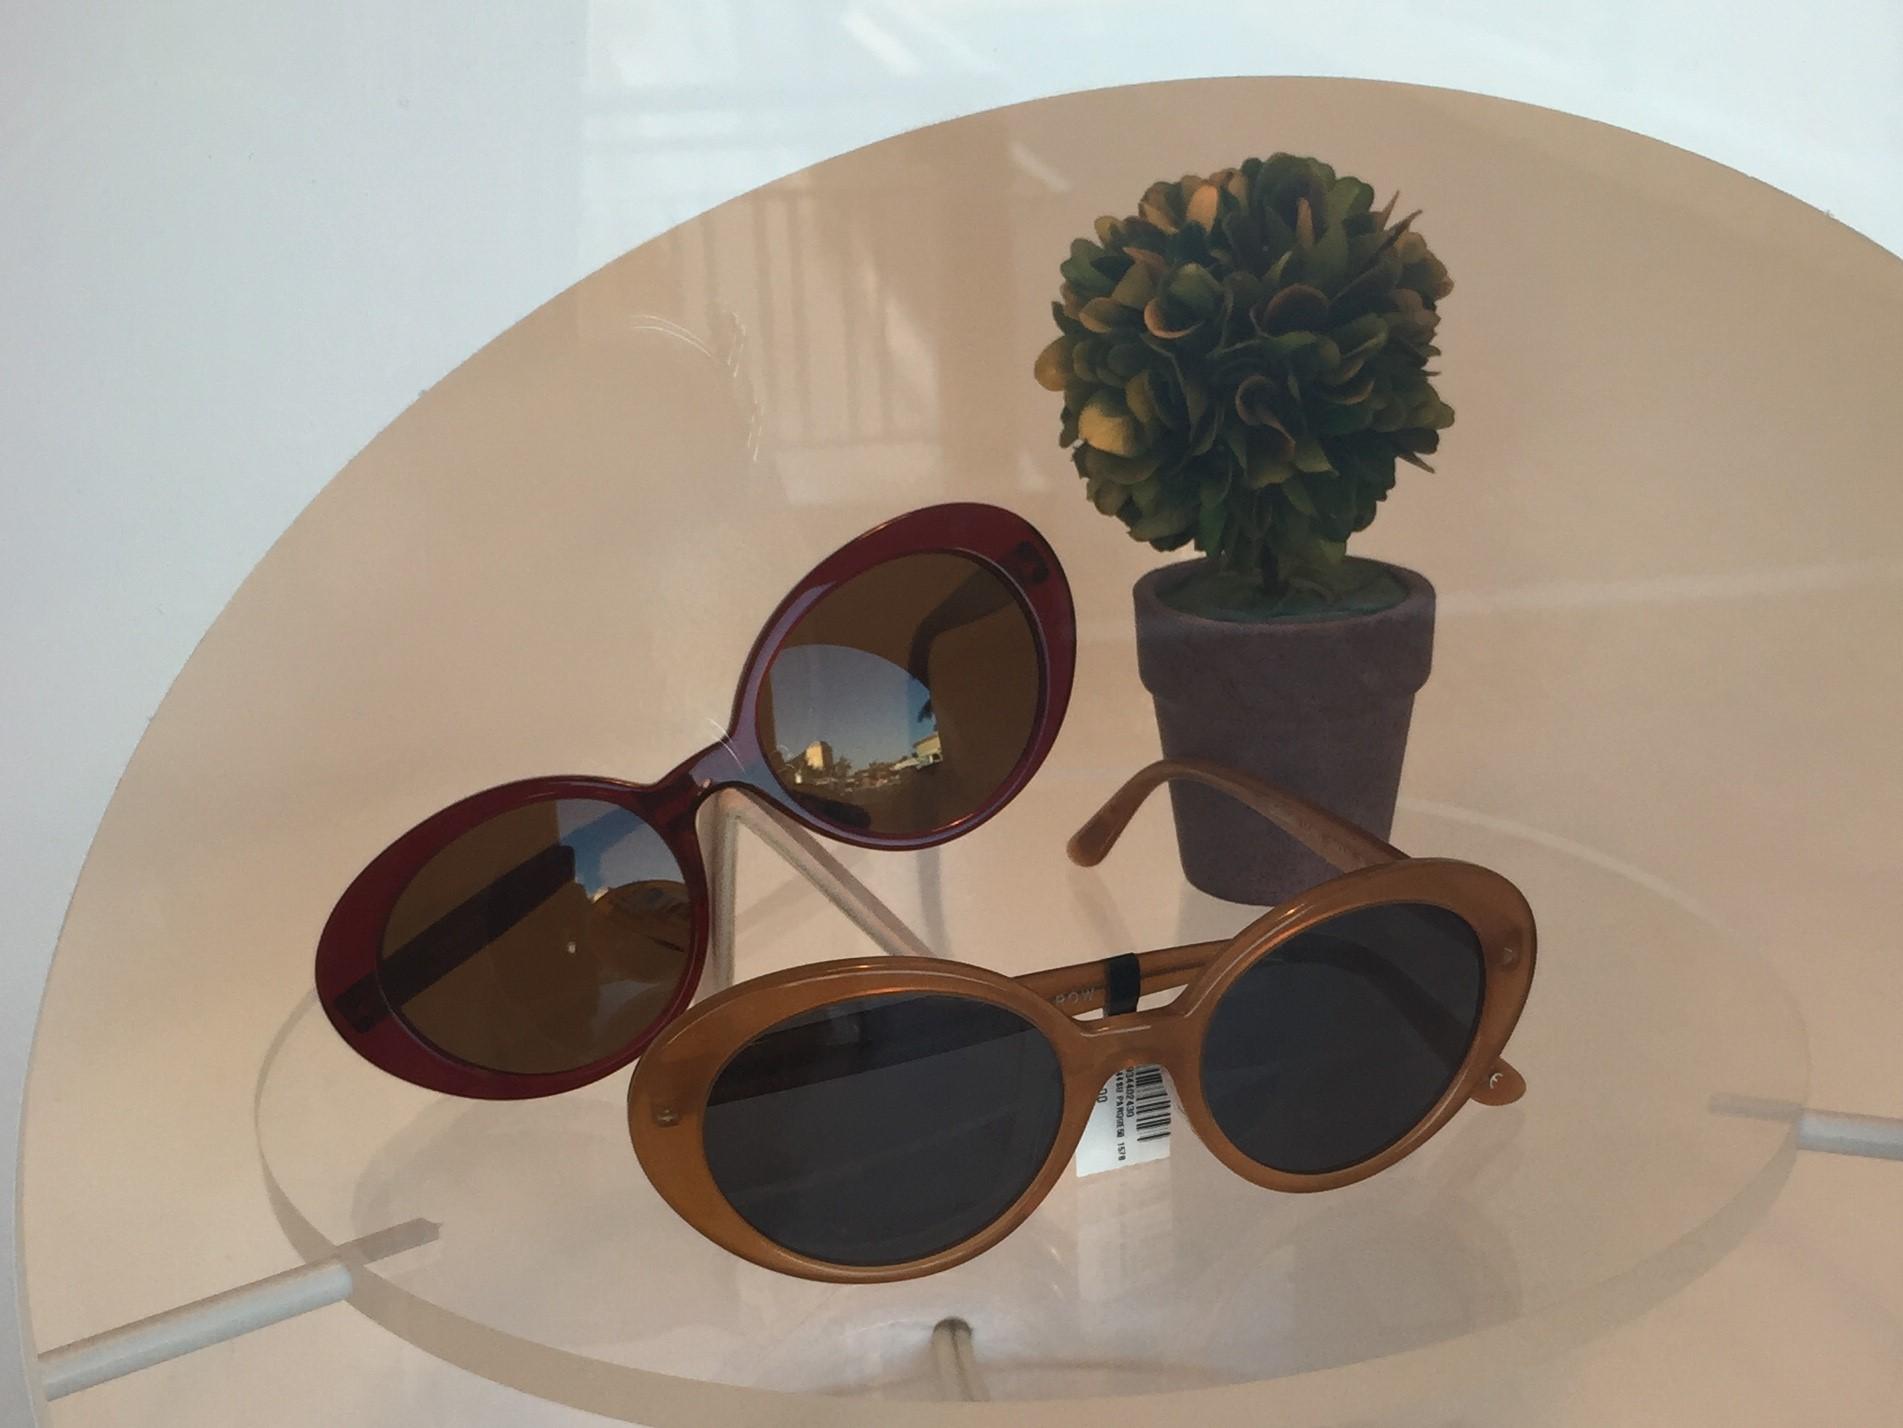 Fashion Valley Sunglasses Store